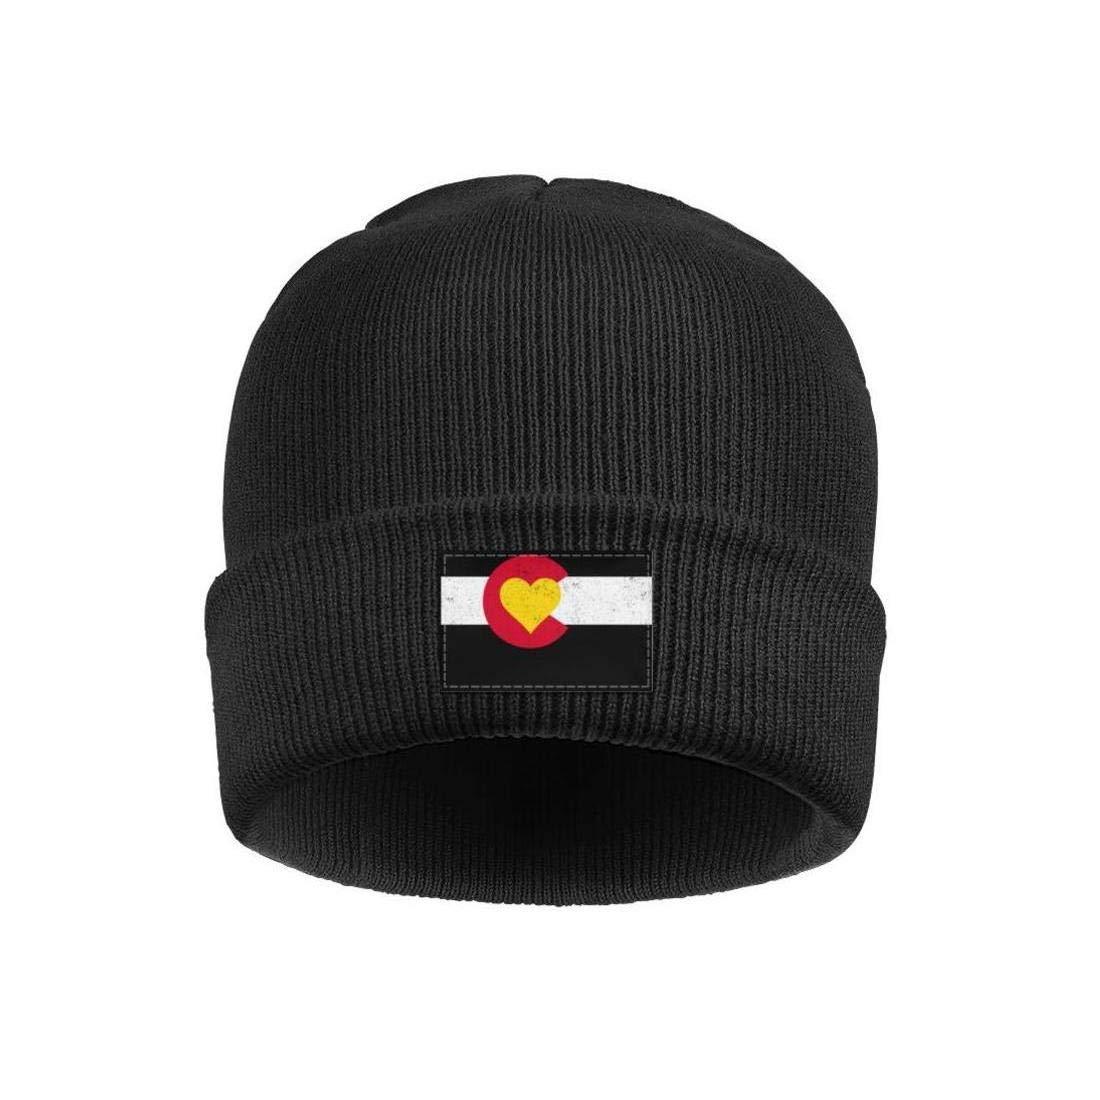 Mens Slouchy Beanie Hat Fine Knit Hats Colorado Love Flag Colorado on My Mind Warm Cap